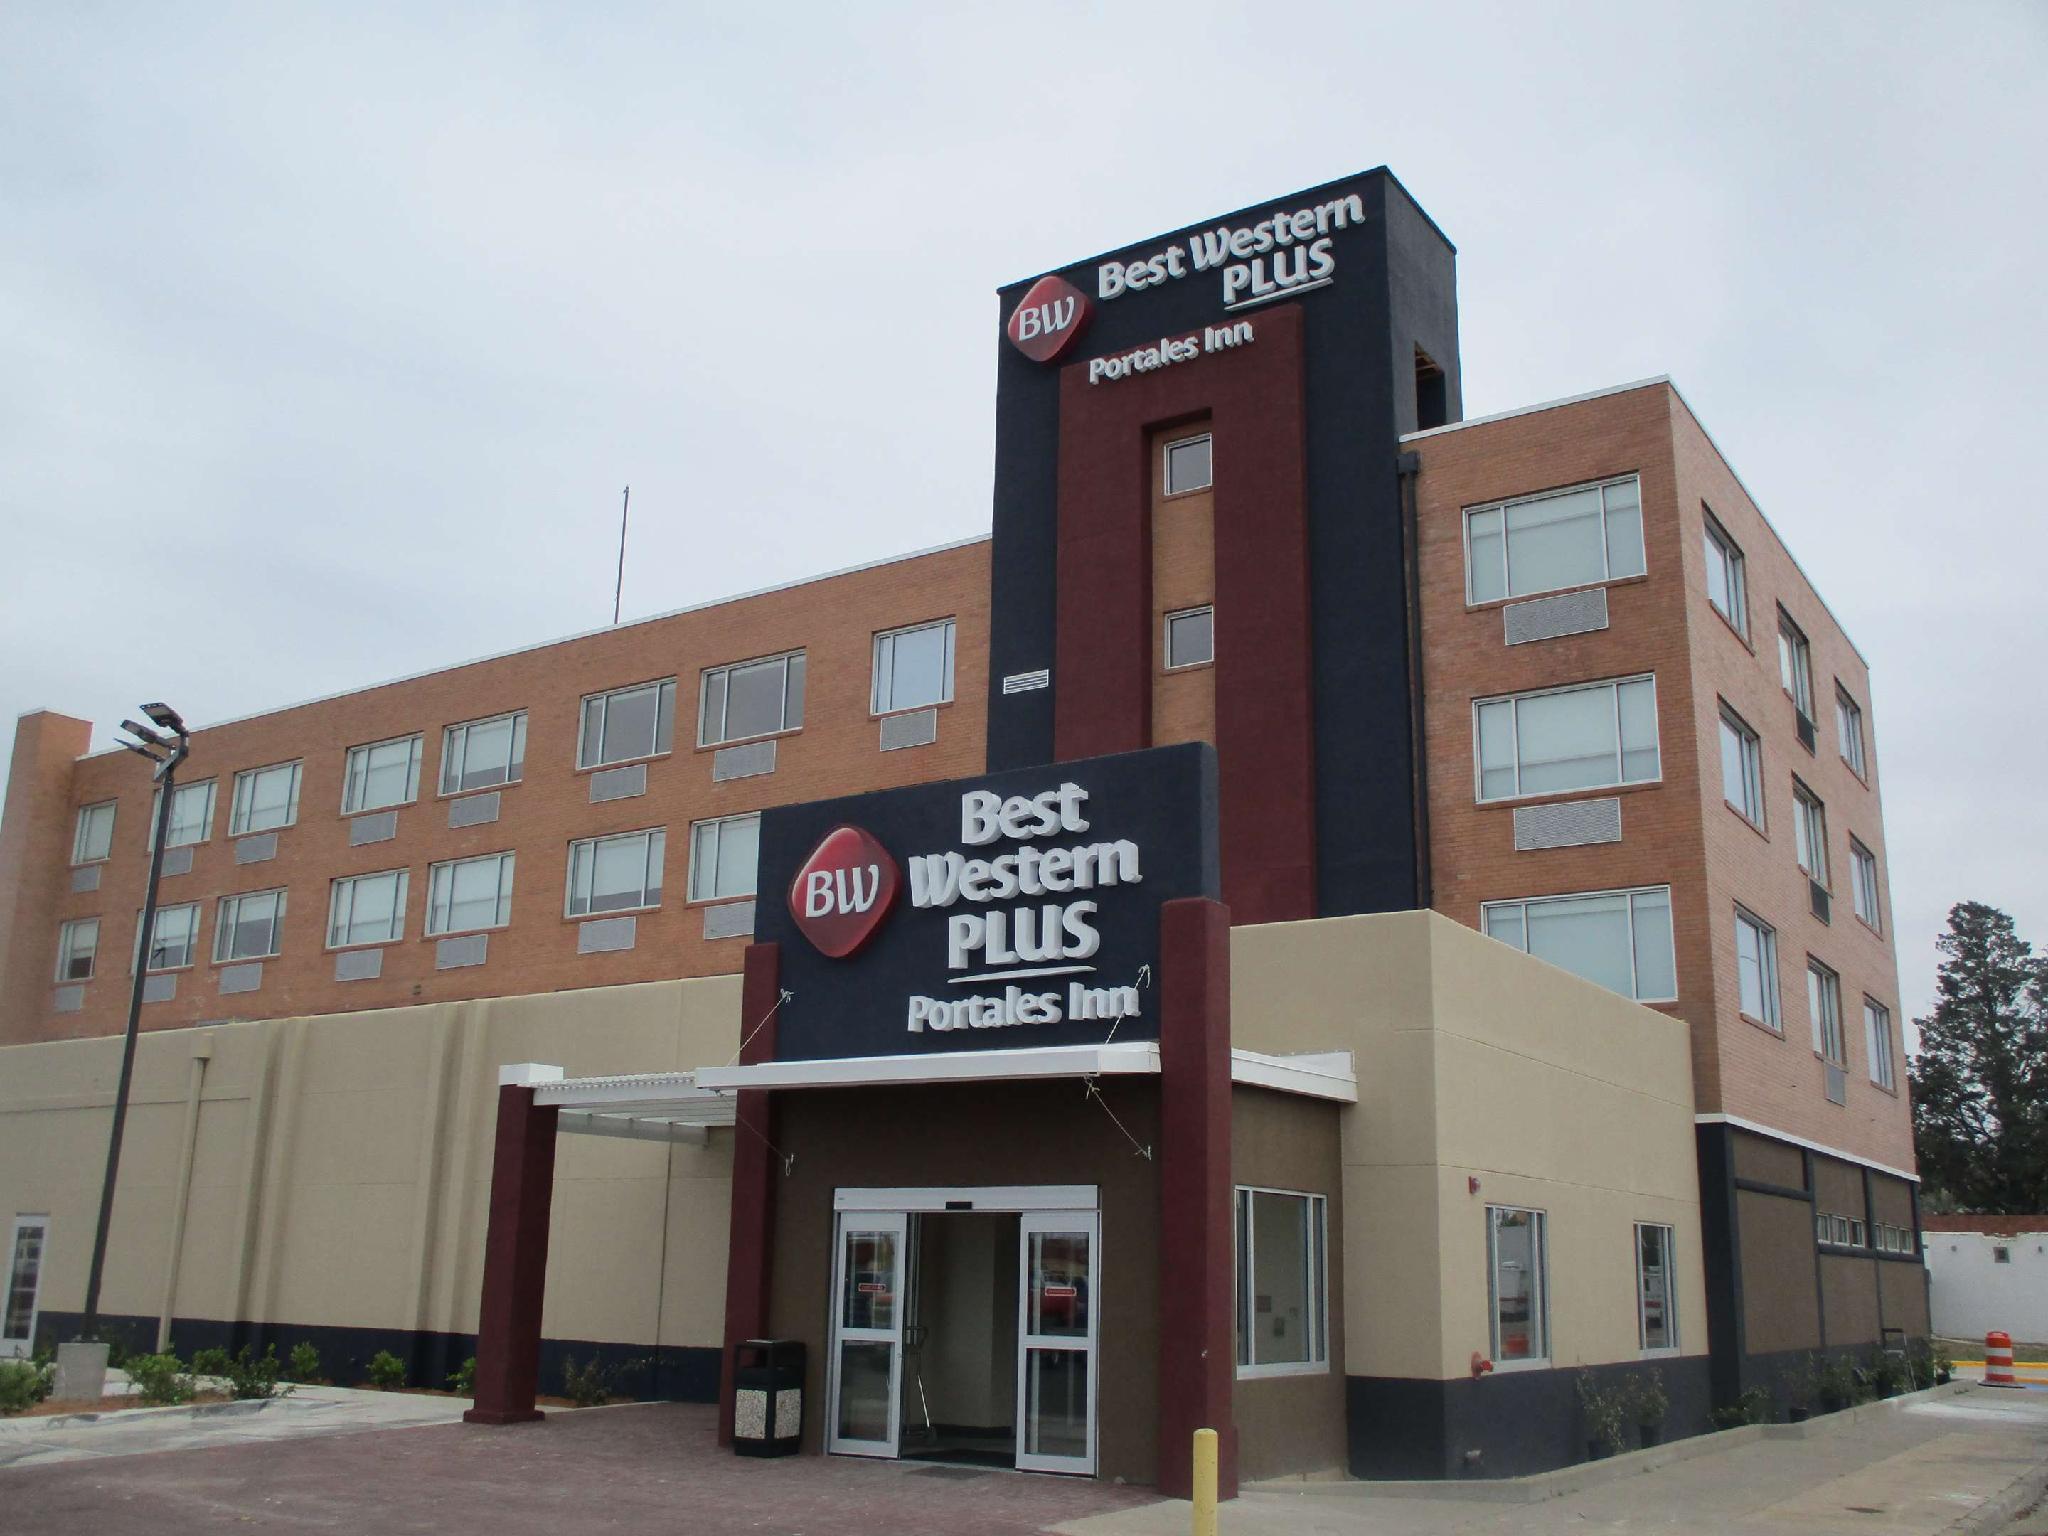 Best Western Plus Portales Inn, Roosevelt